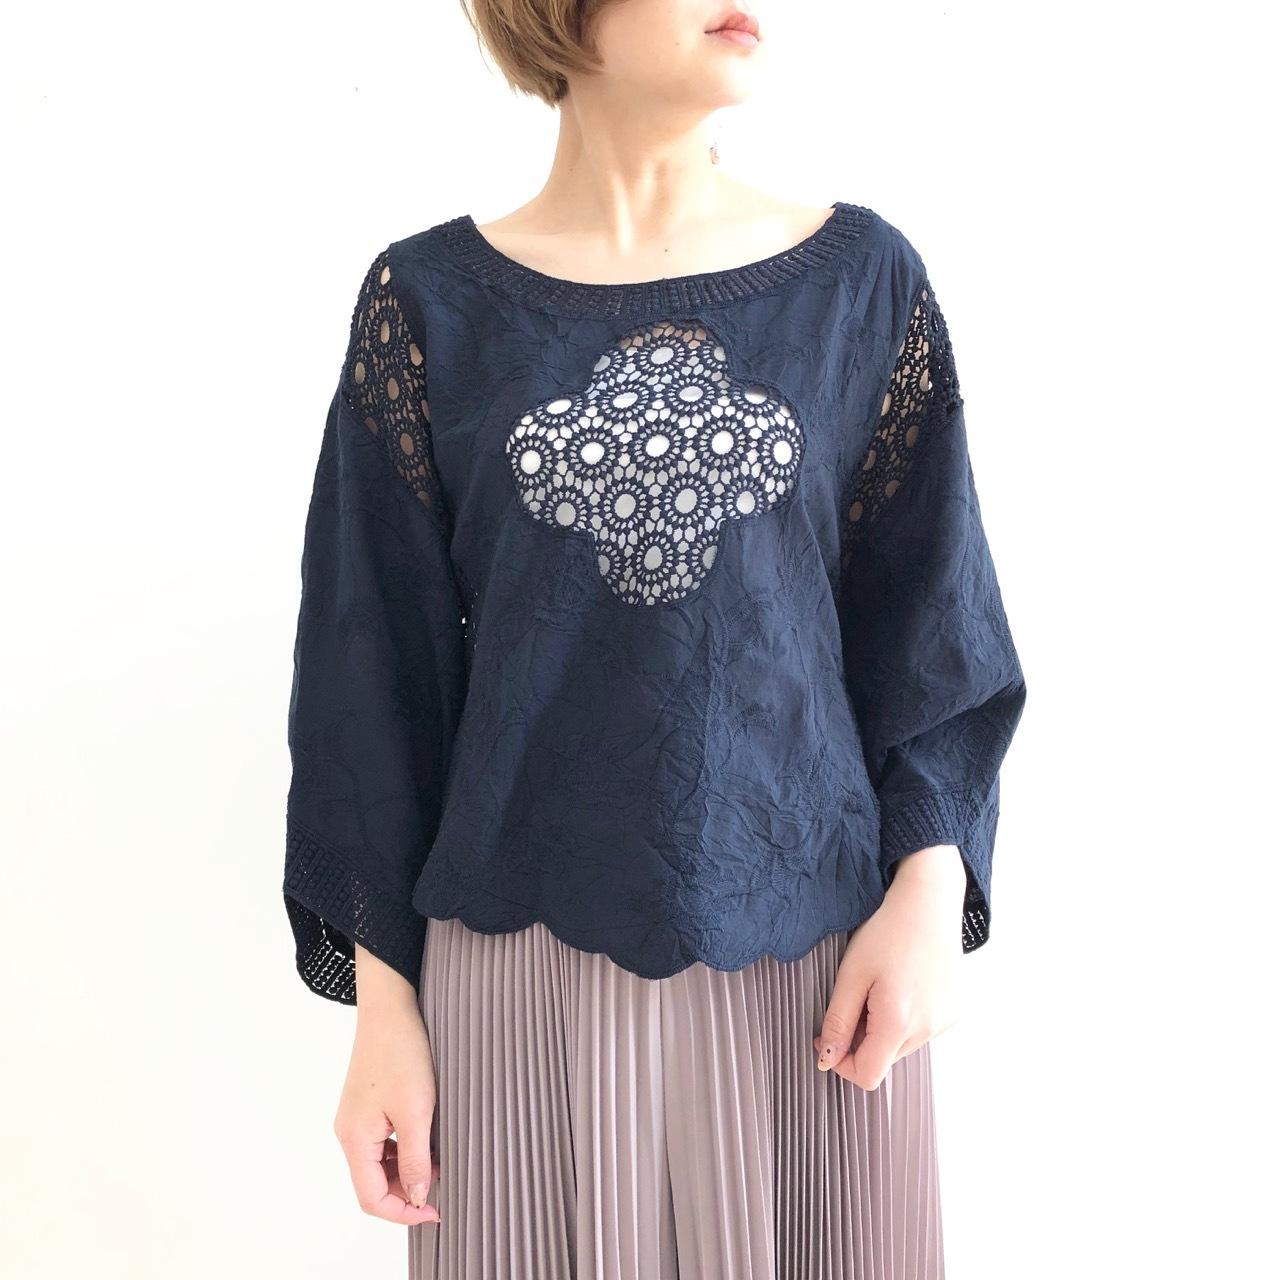 【 Valance Select 】刺繍レースブラウス